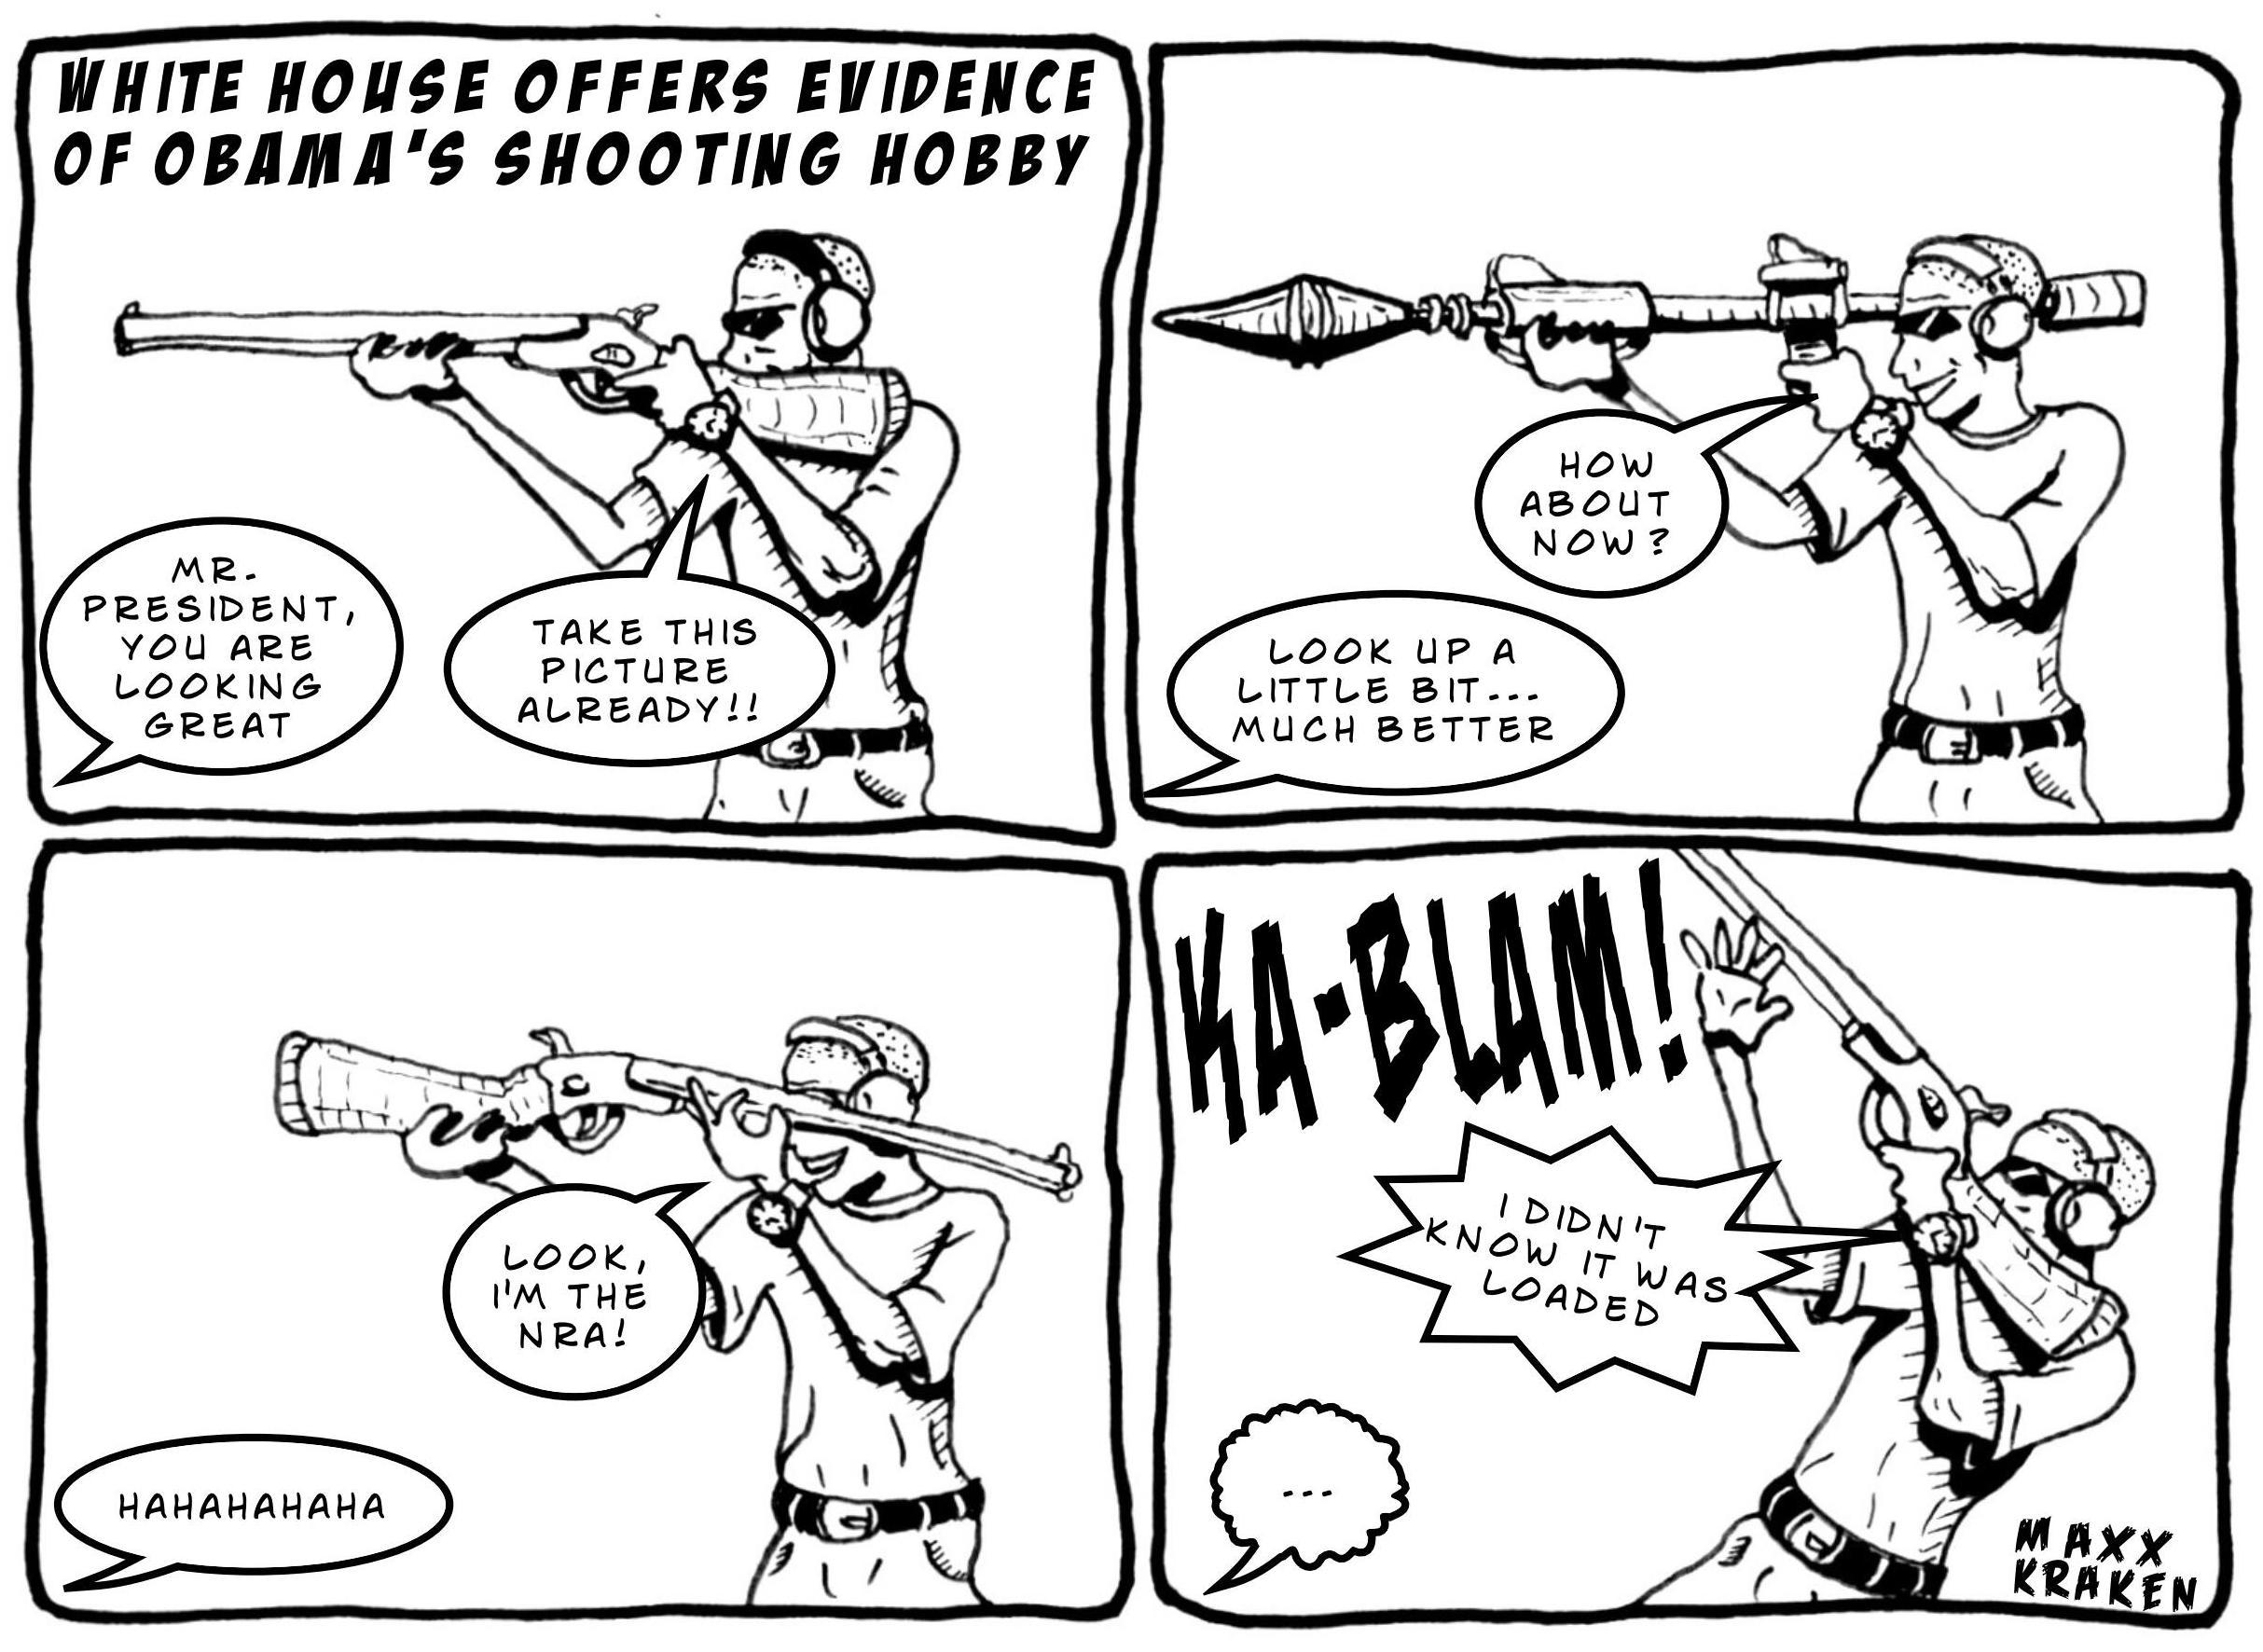 Obama's Shooting Hobby